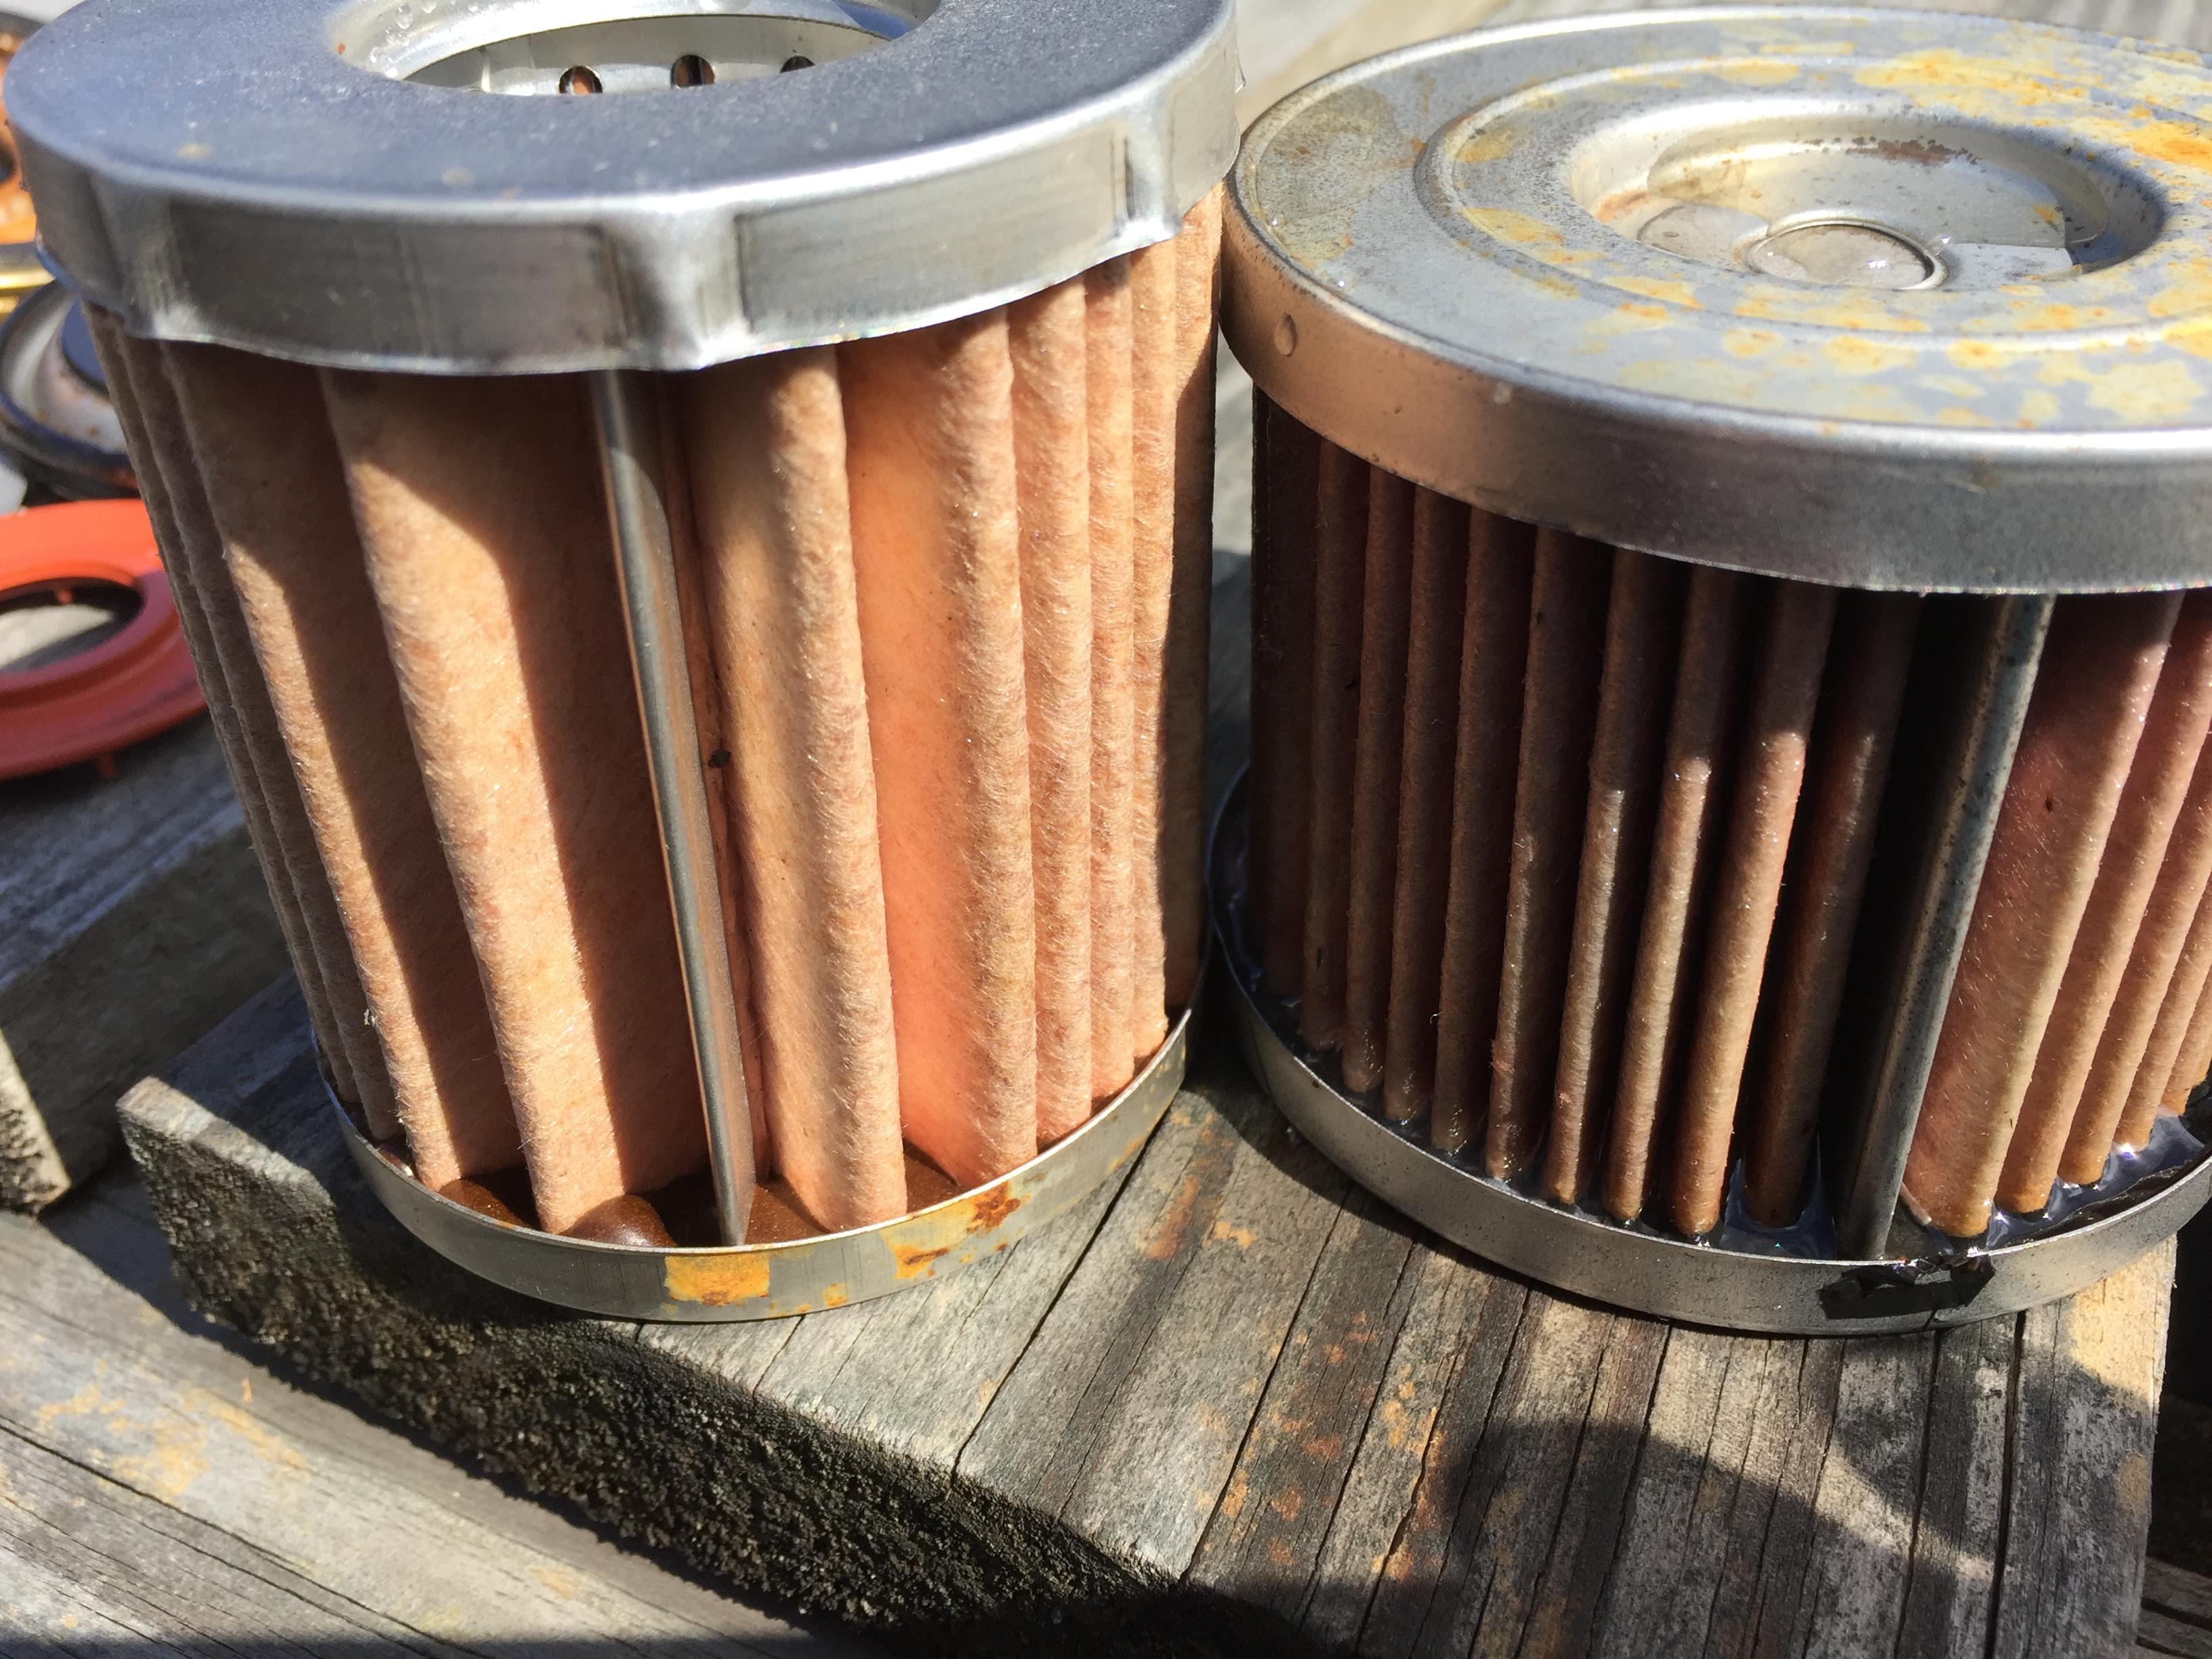 Napa Gold 7356 5950 Mi Cut Open Engine Oil Filters